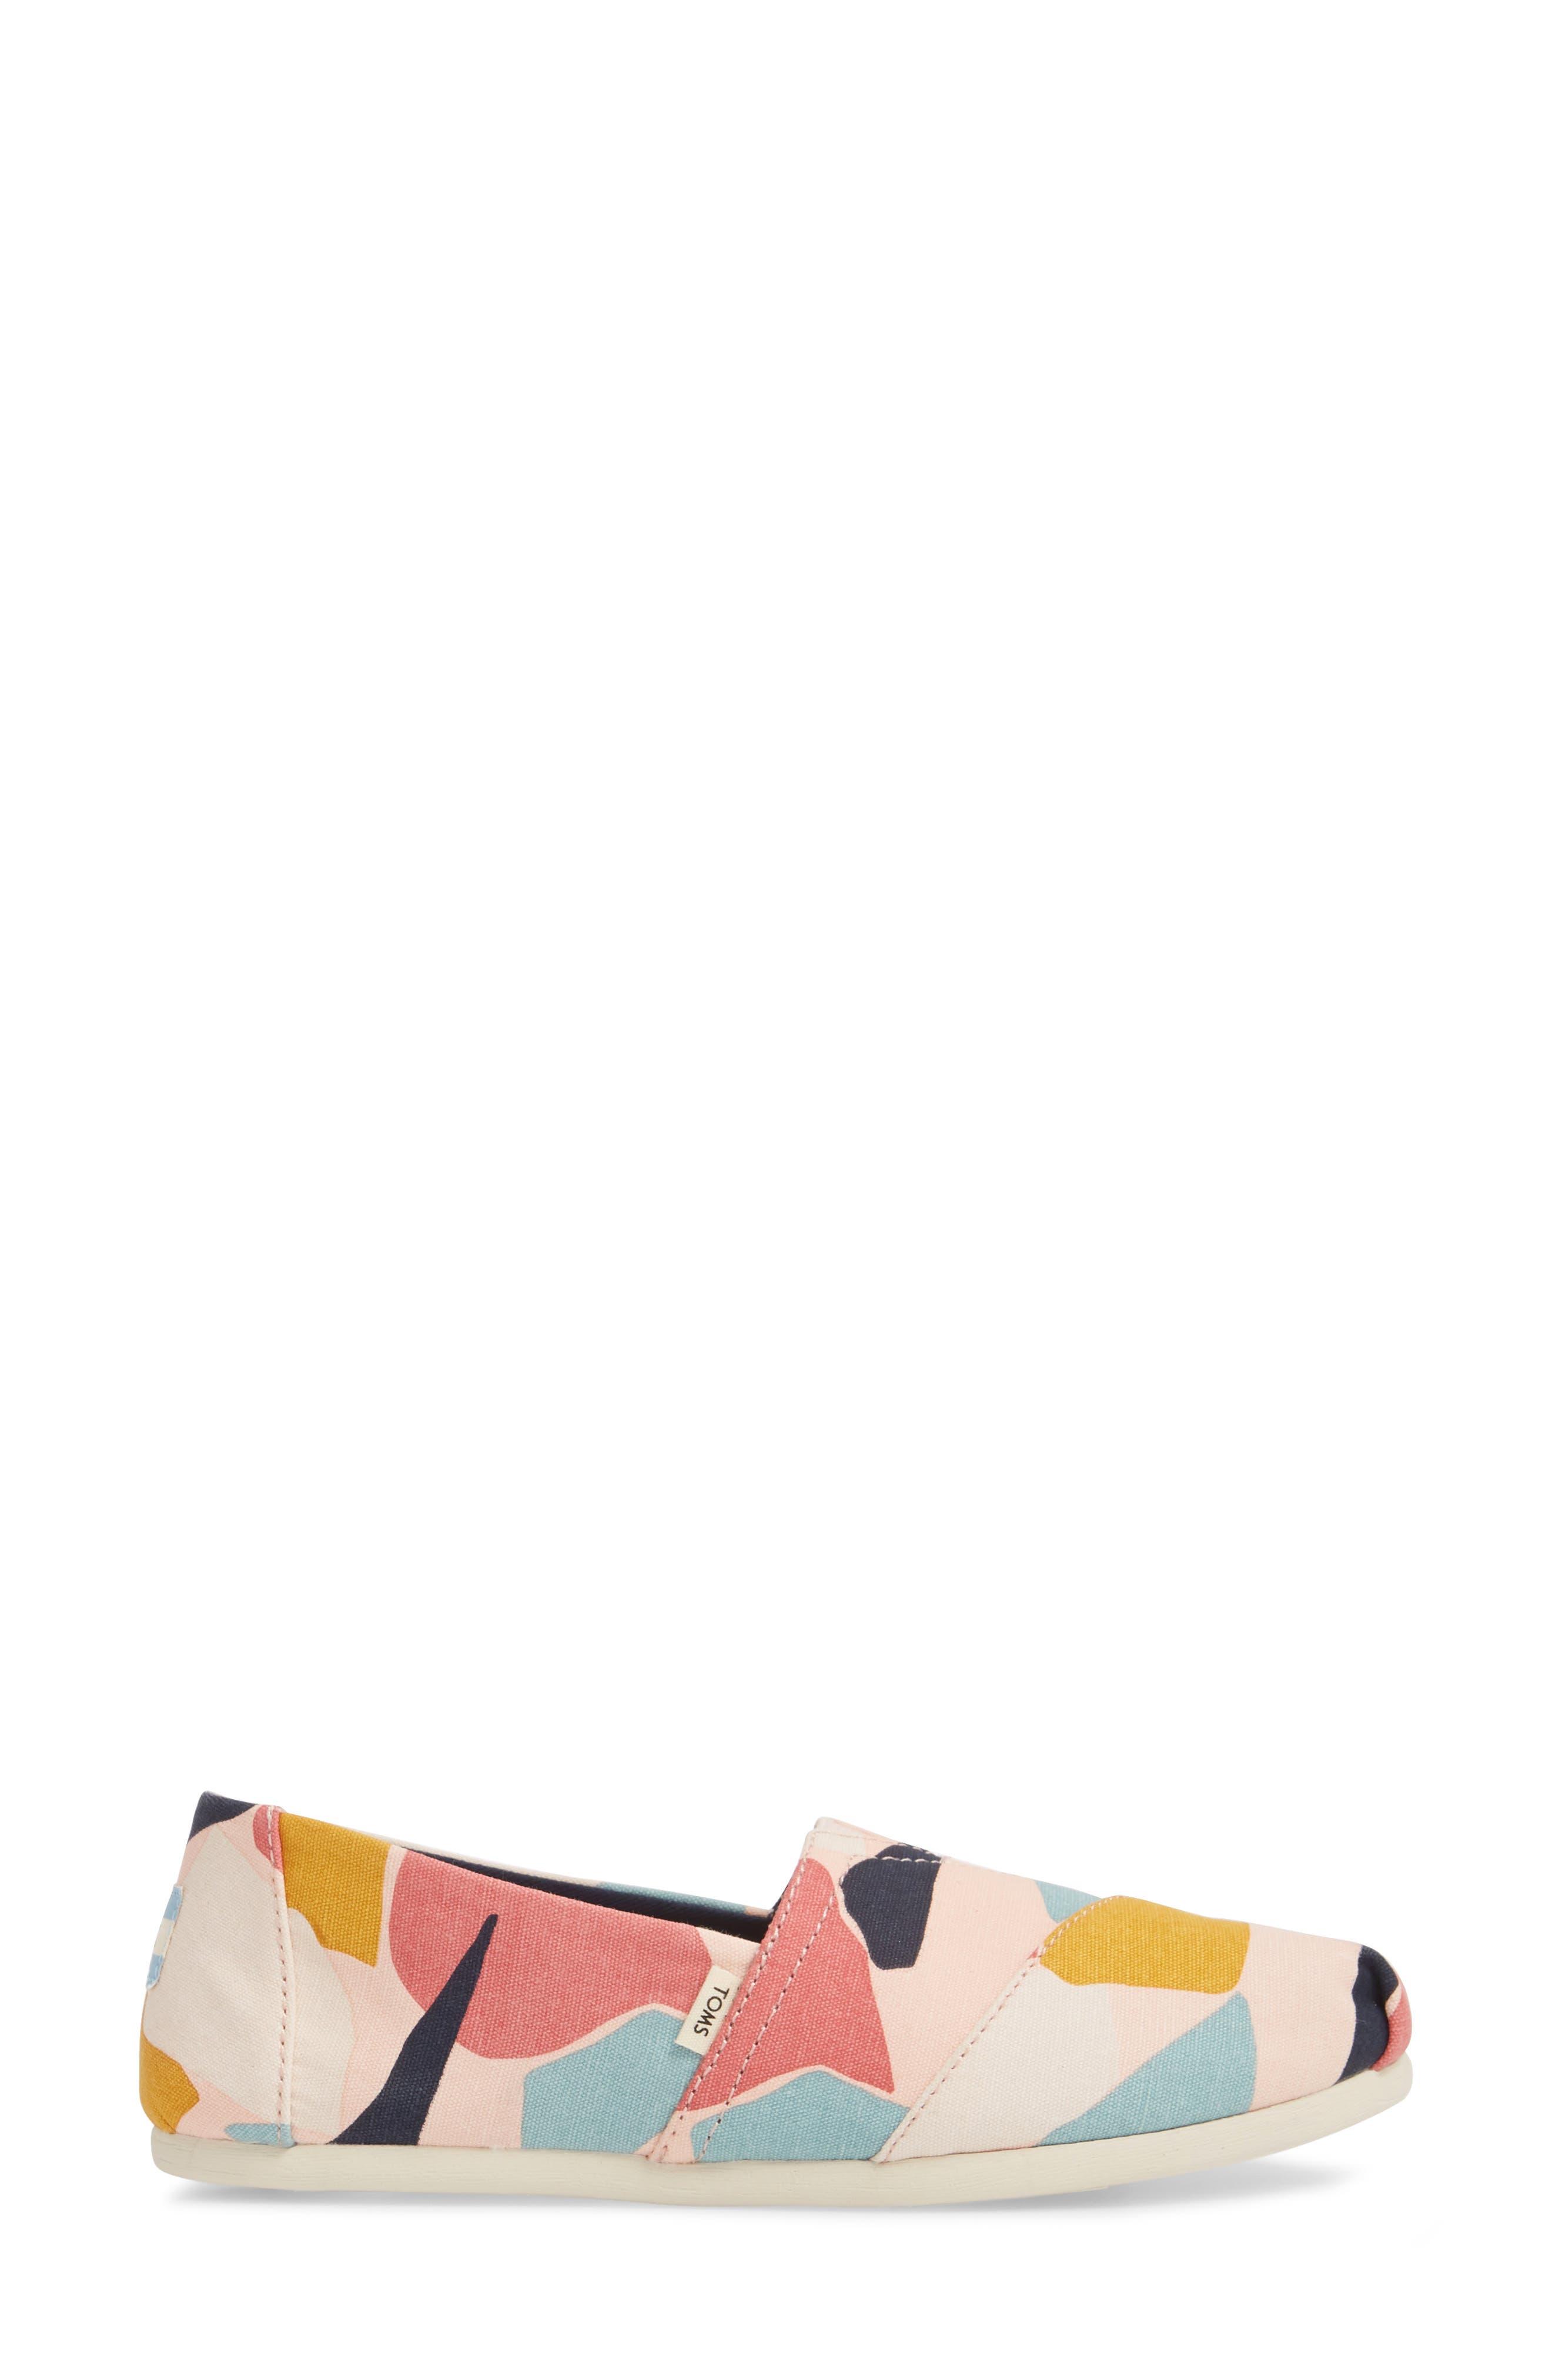 Alpargata Slip-On Sneaker,                             Alternate thumbnail 3, color,                             ROSE GLOW PRINT CANVAS